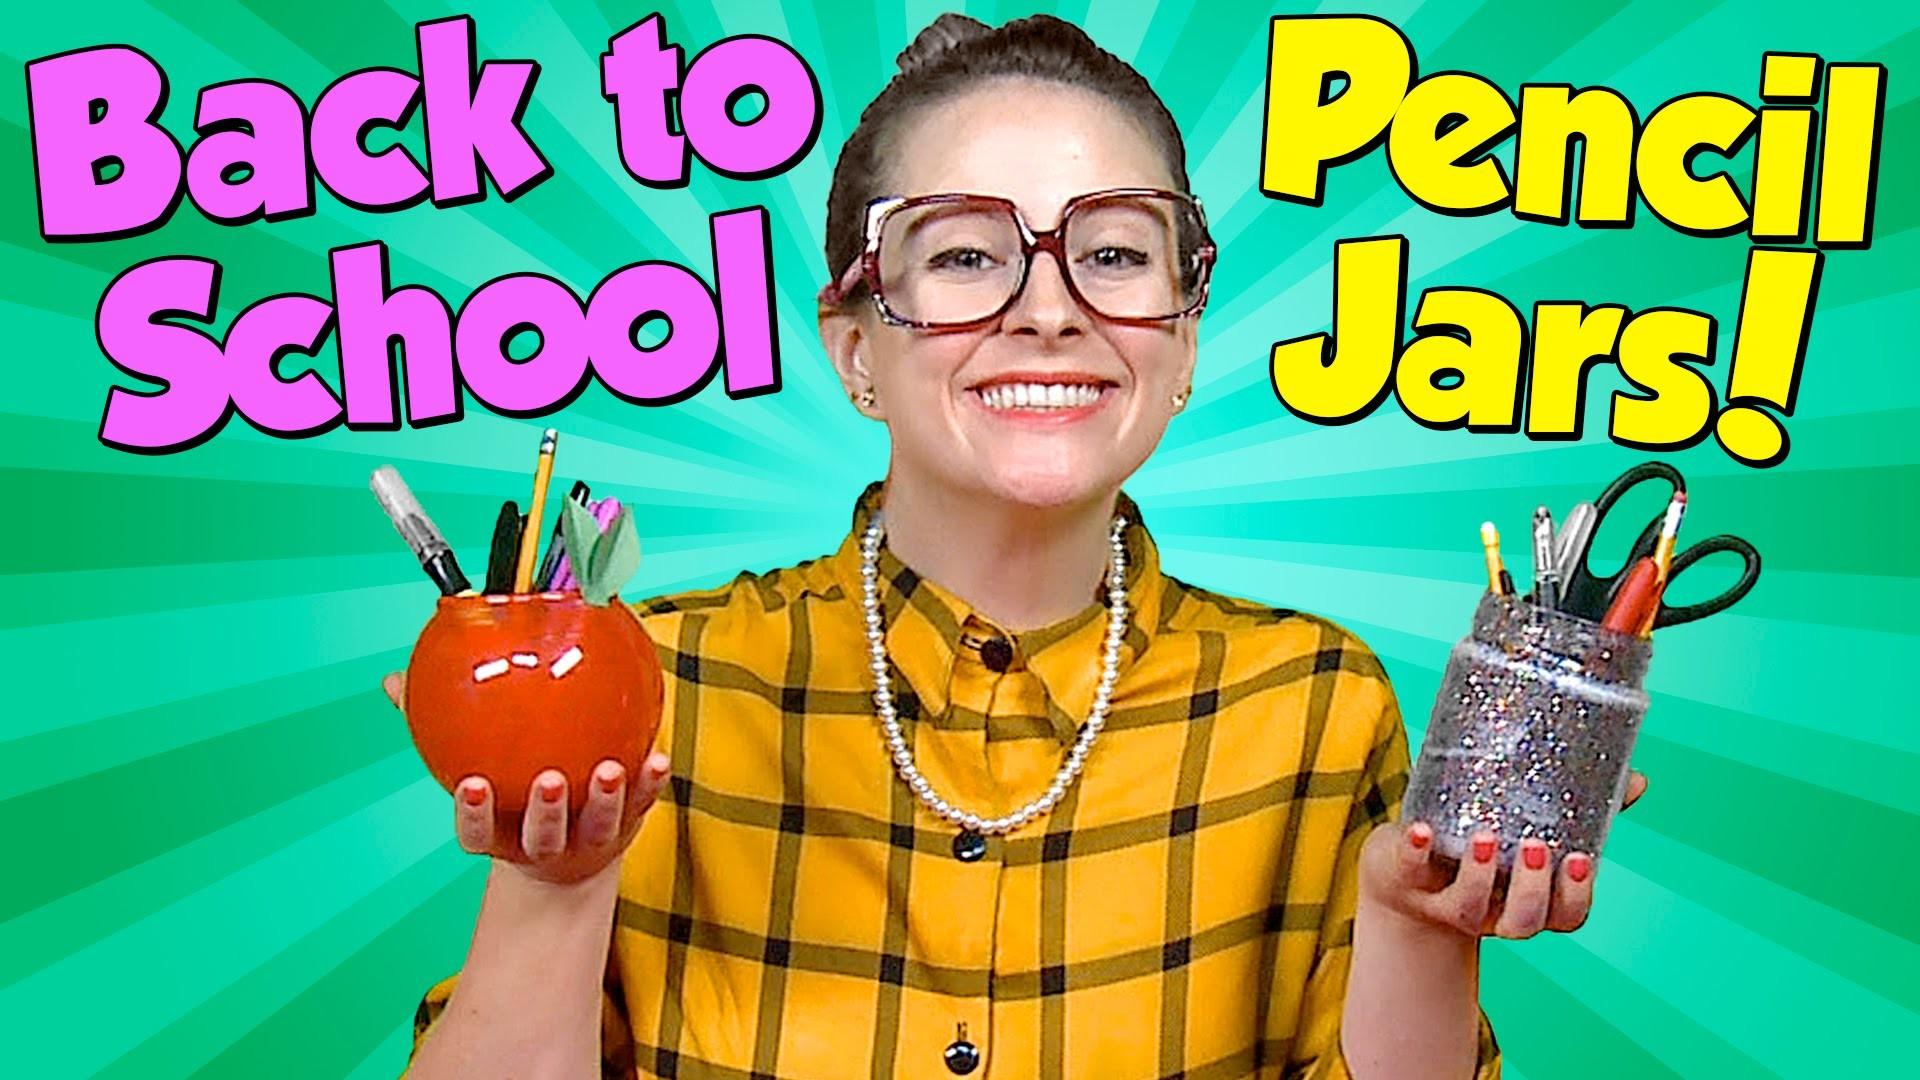 Apple & Glitter Pencil Jars - Teacher Gifts - Back to School | Cool School Crafts with Crafty Carol